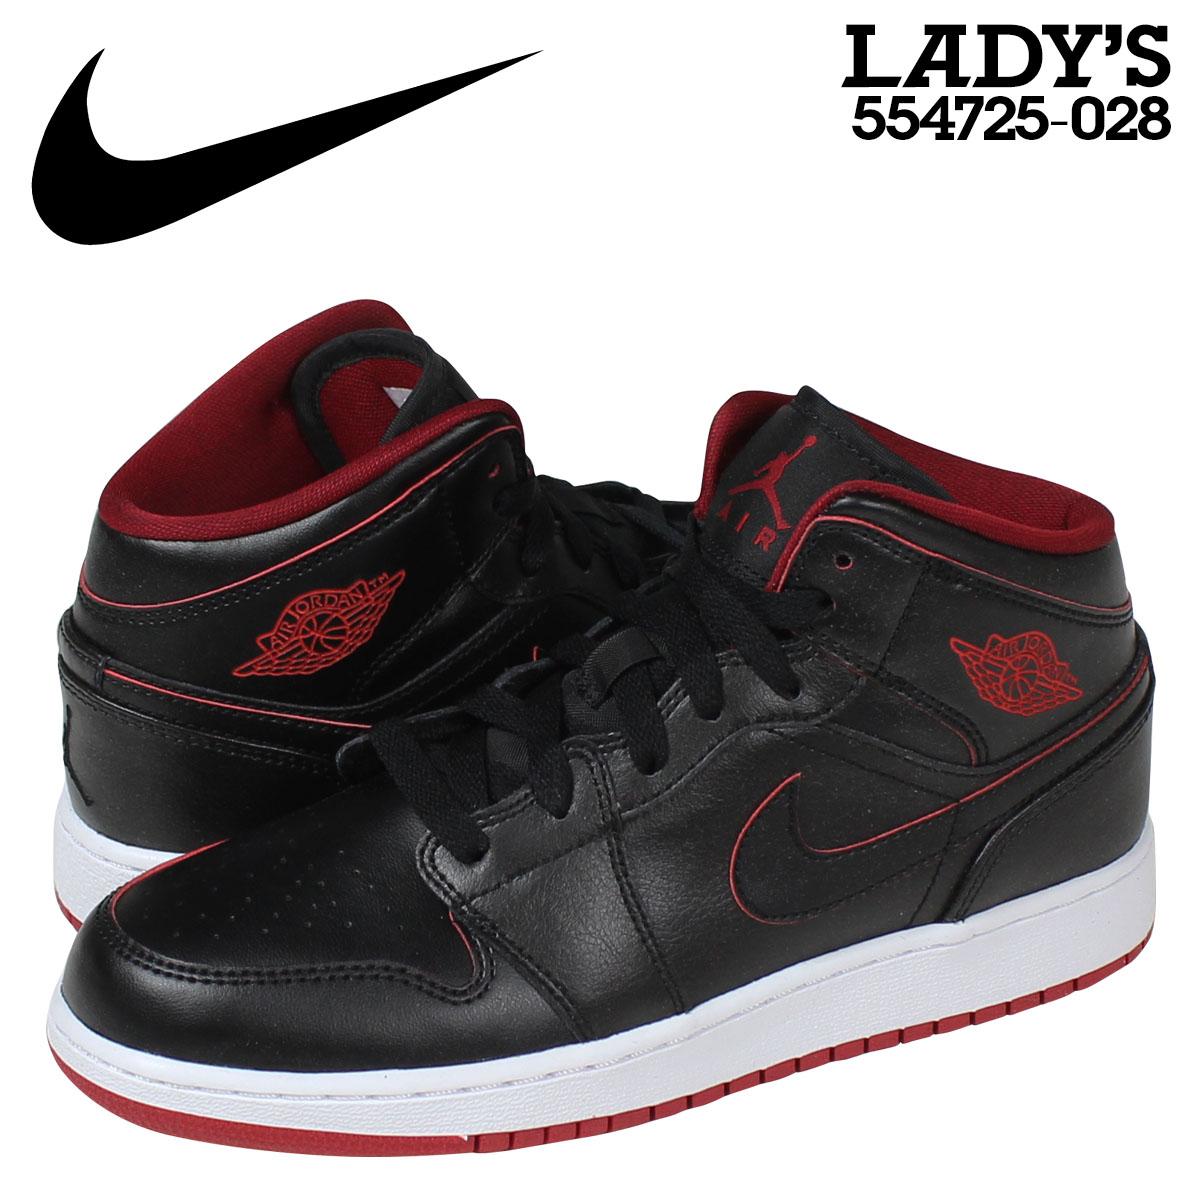 Nike Air Jordan 1 Mid BG Black Triple Black 554725 030